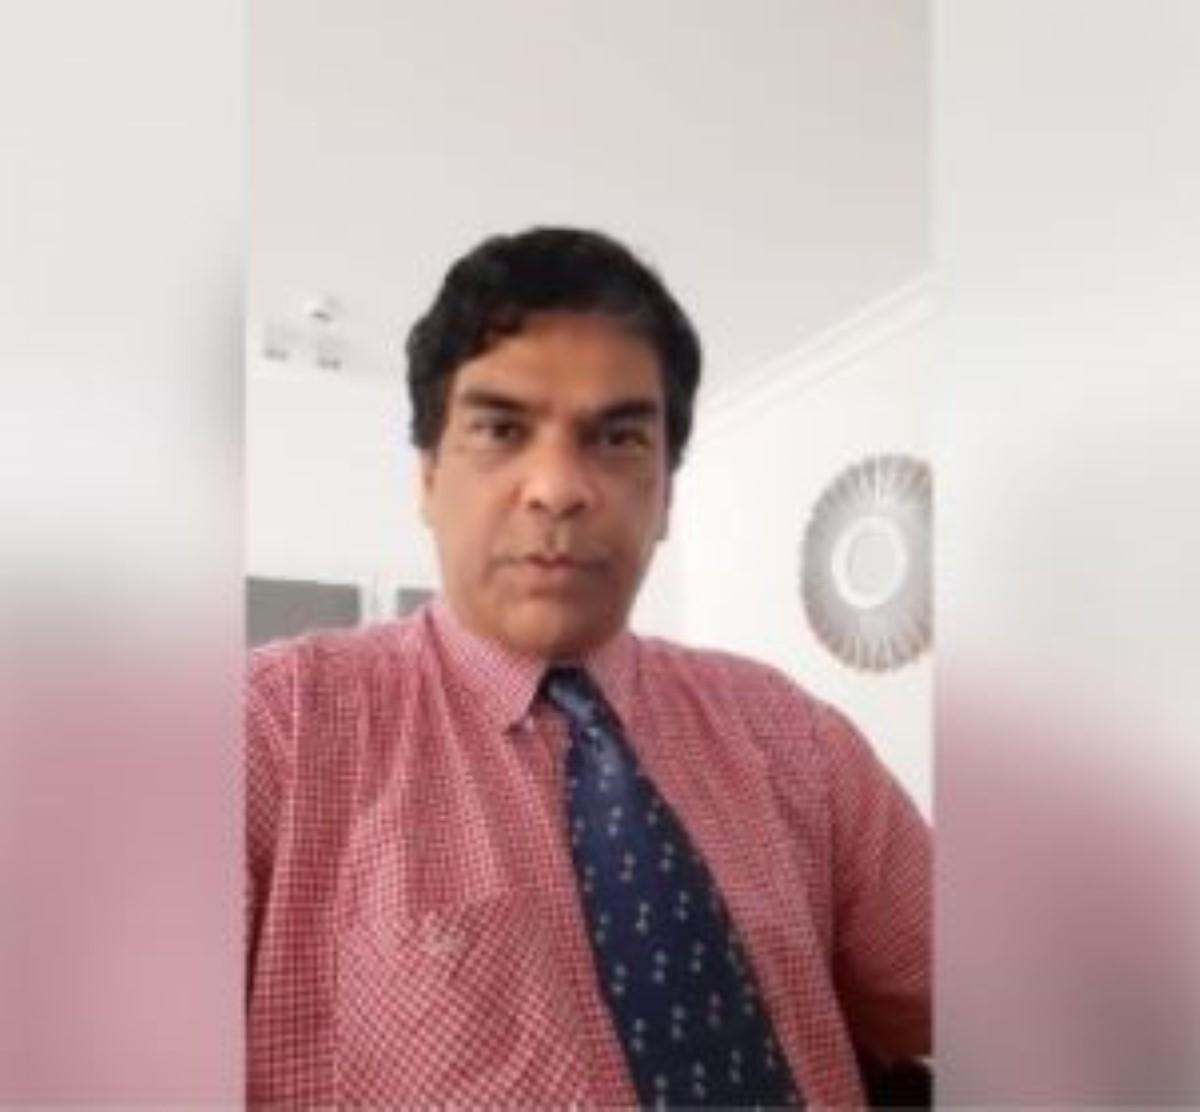 Le Dr Maha Prakash Rambarun de retour dans l'actu